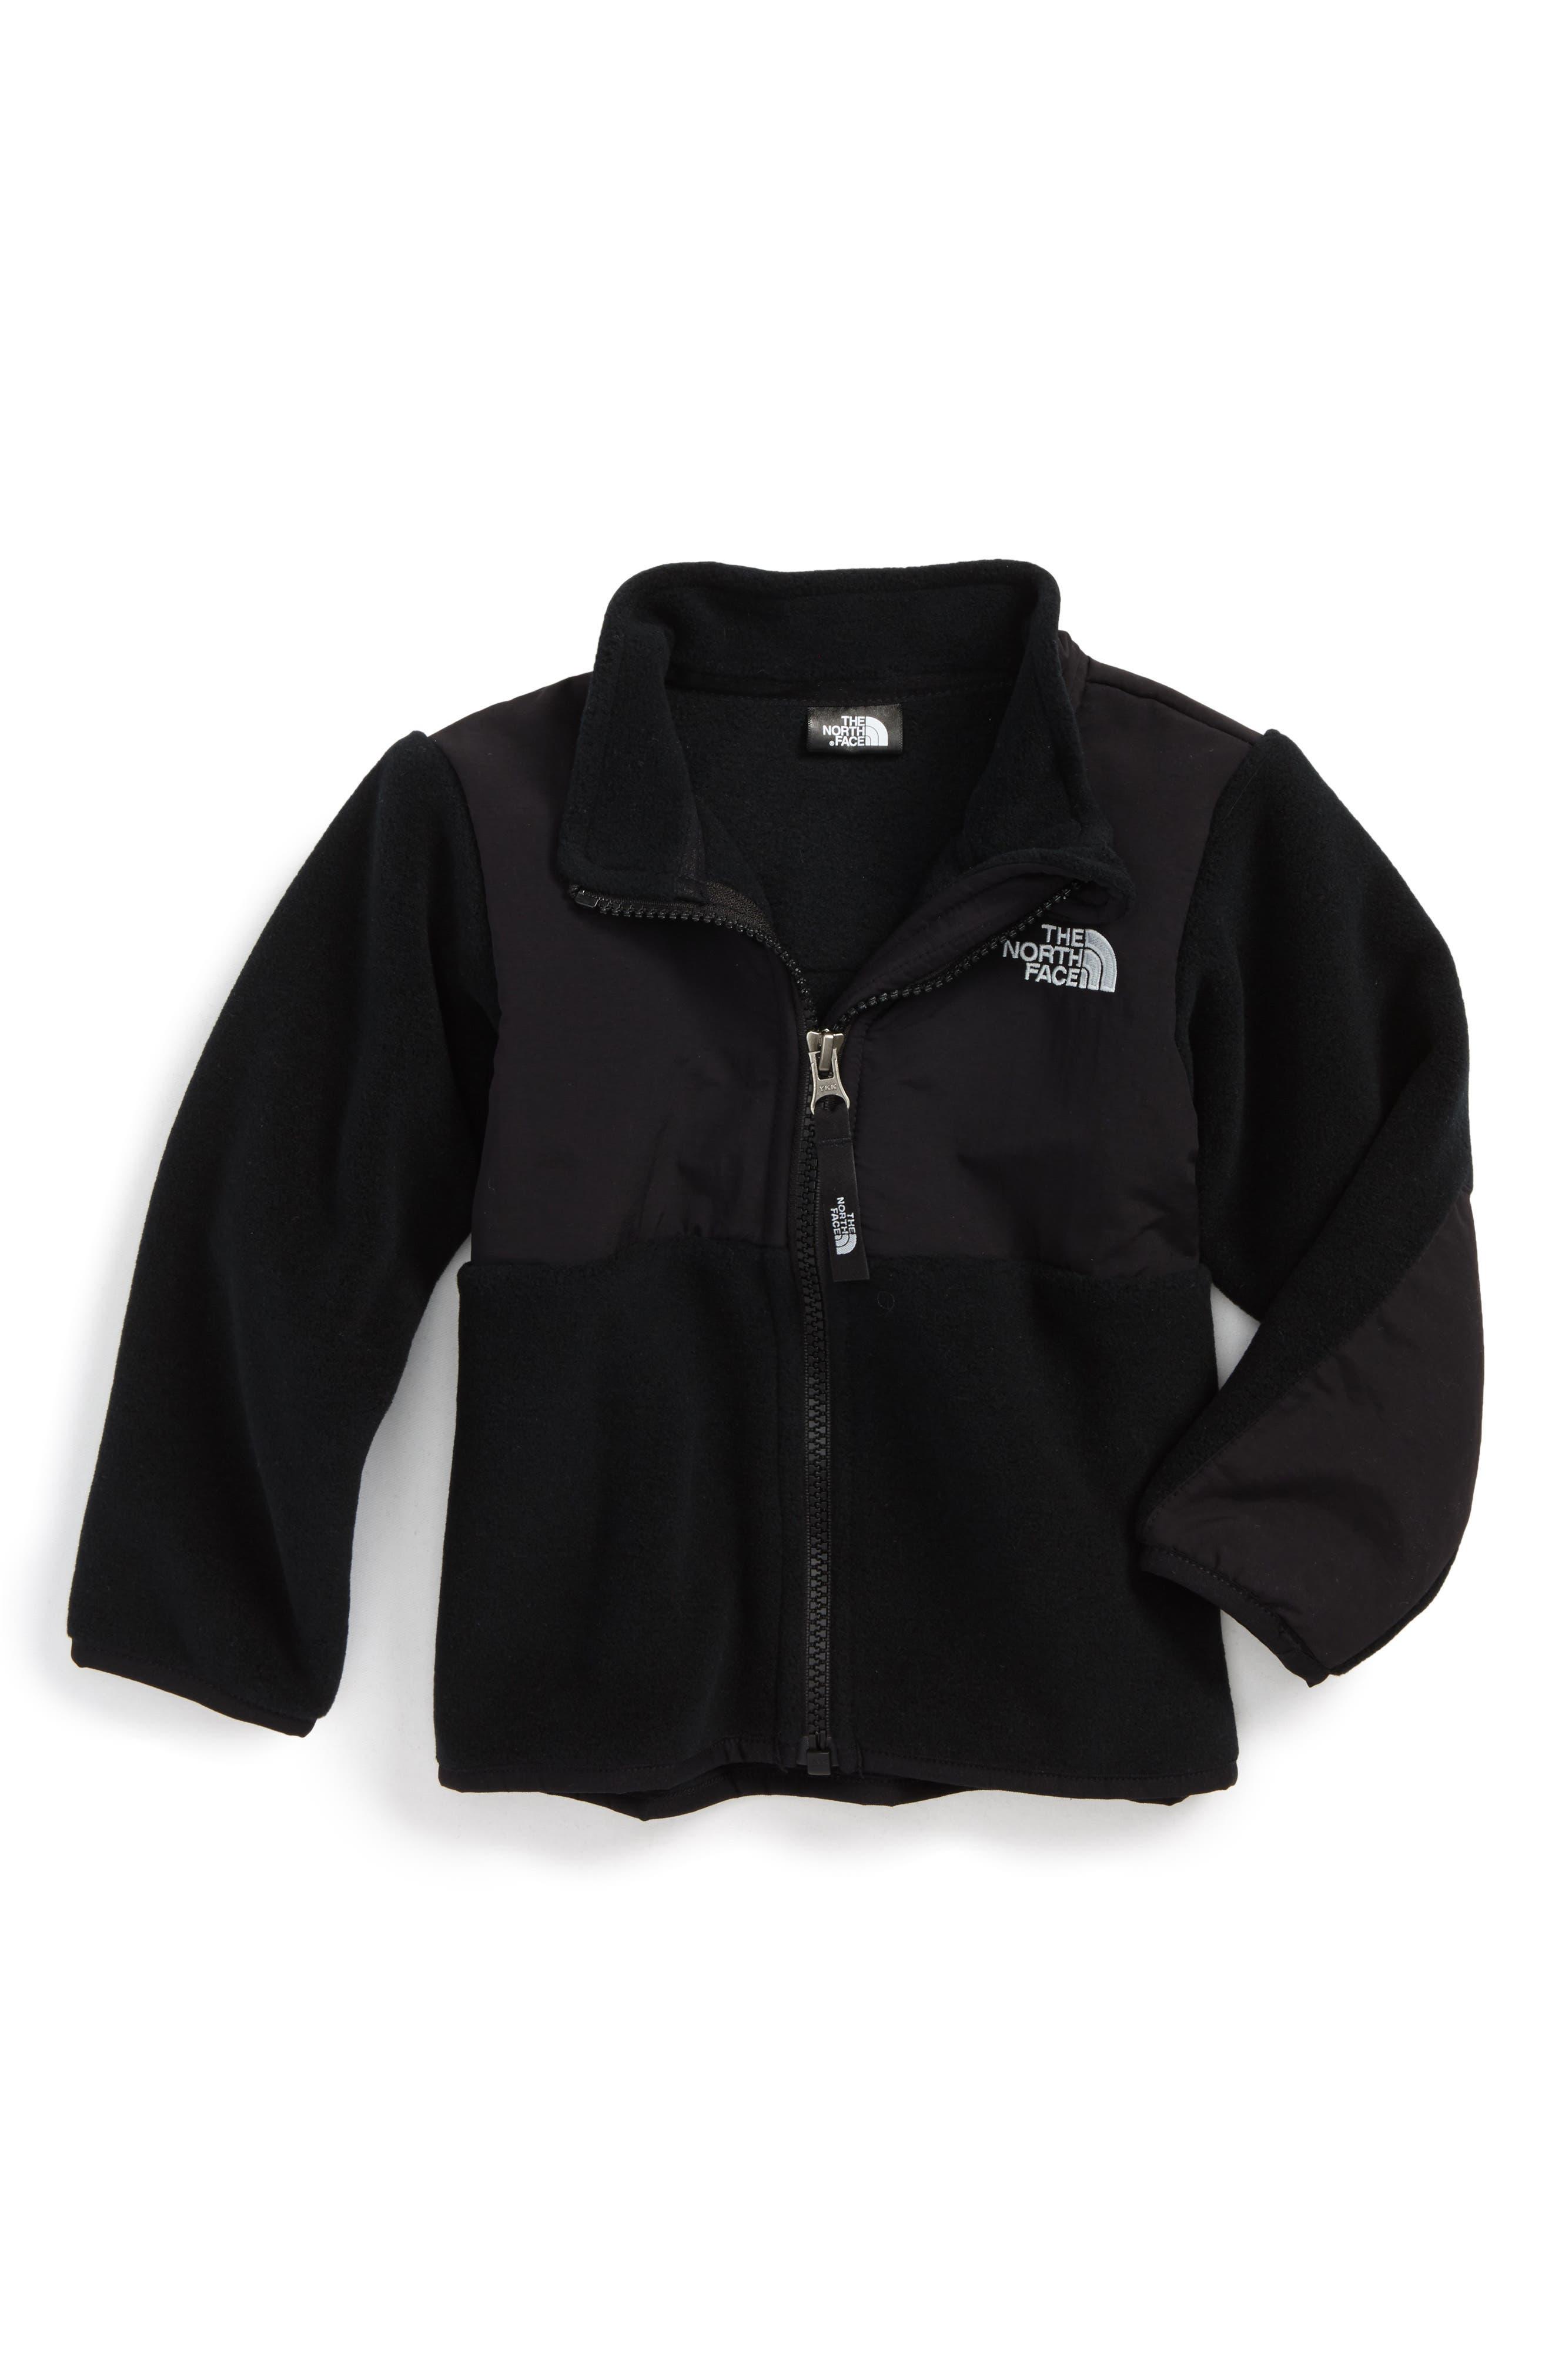 Main Image - The North Face Denali Recycled Fleece Jacket (Baby Boys)